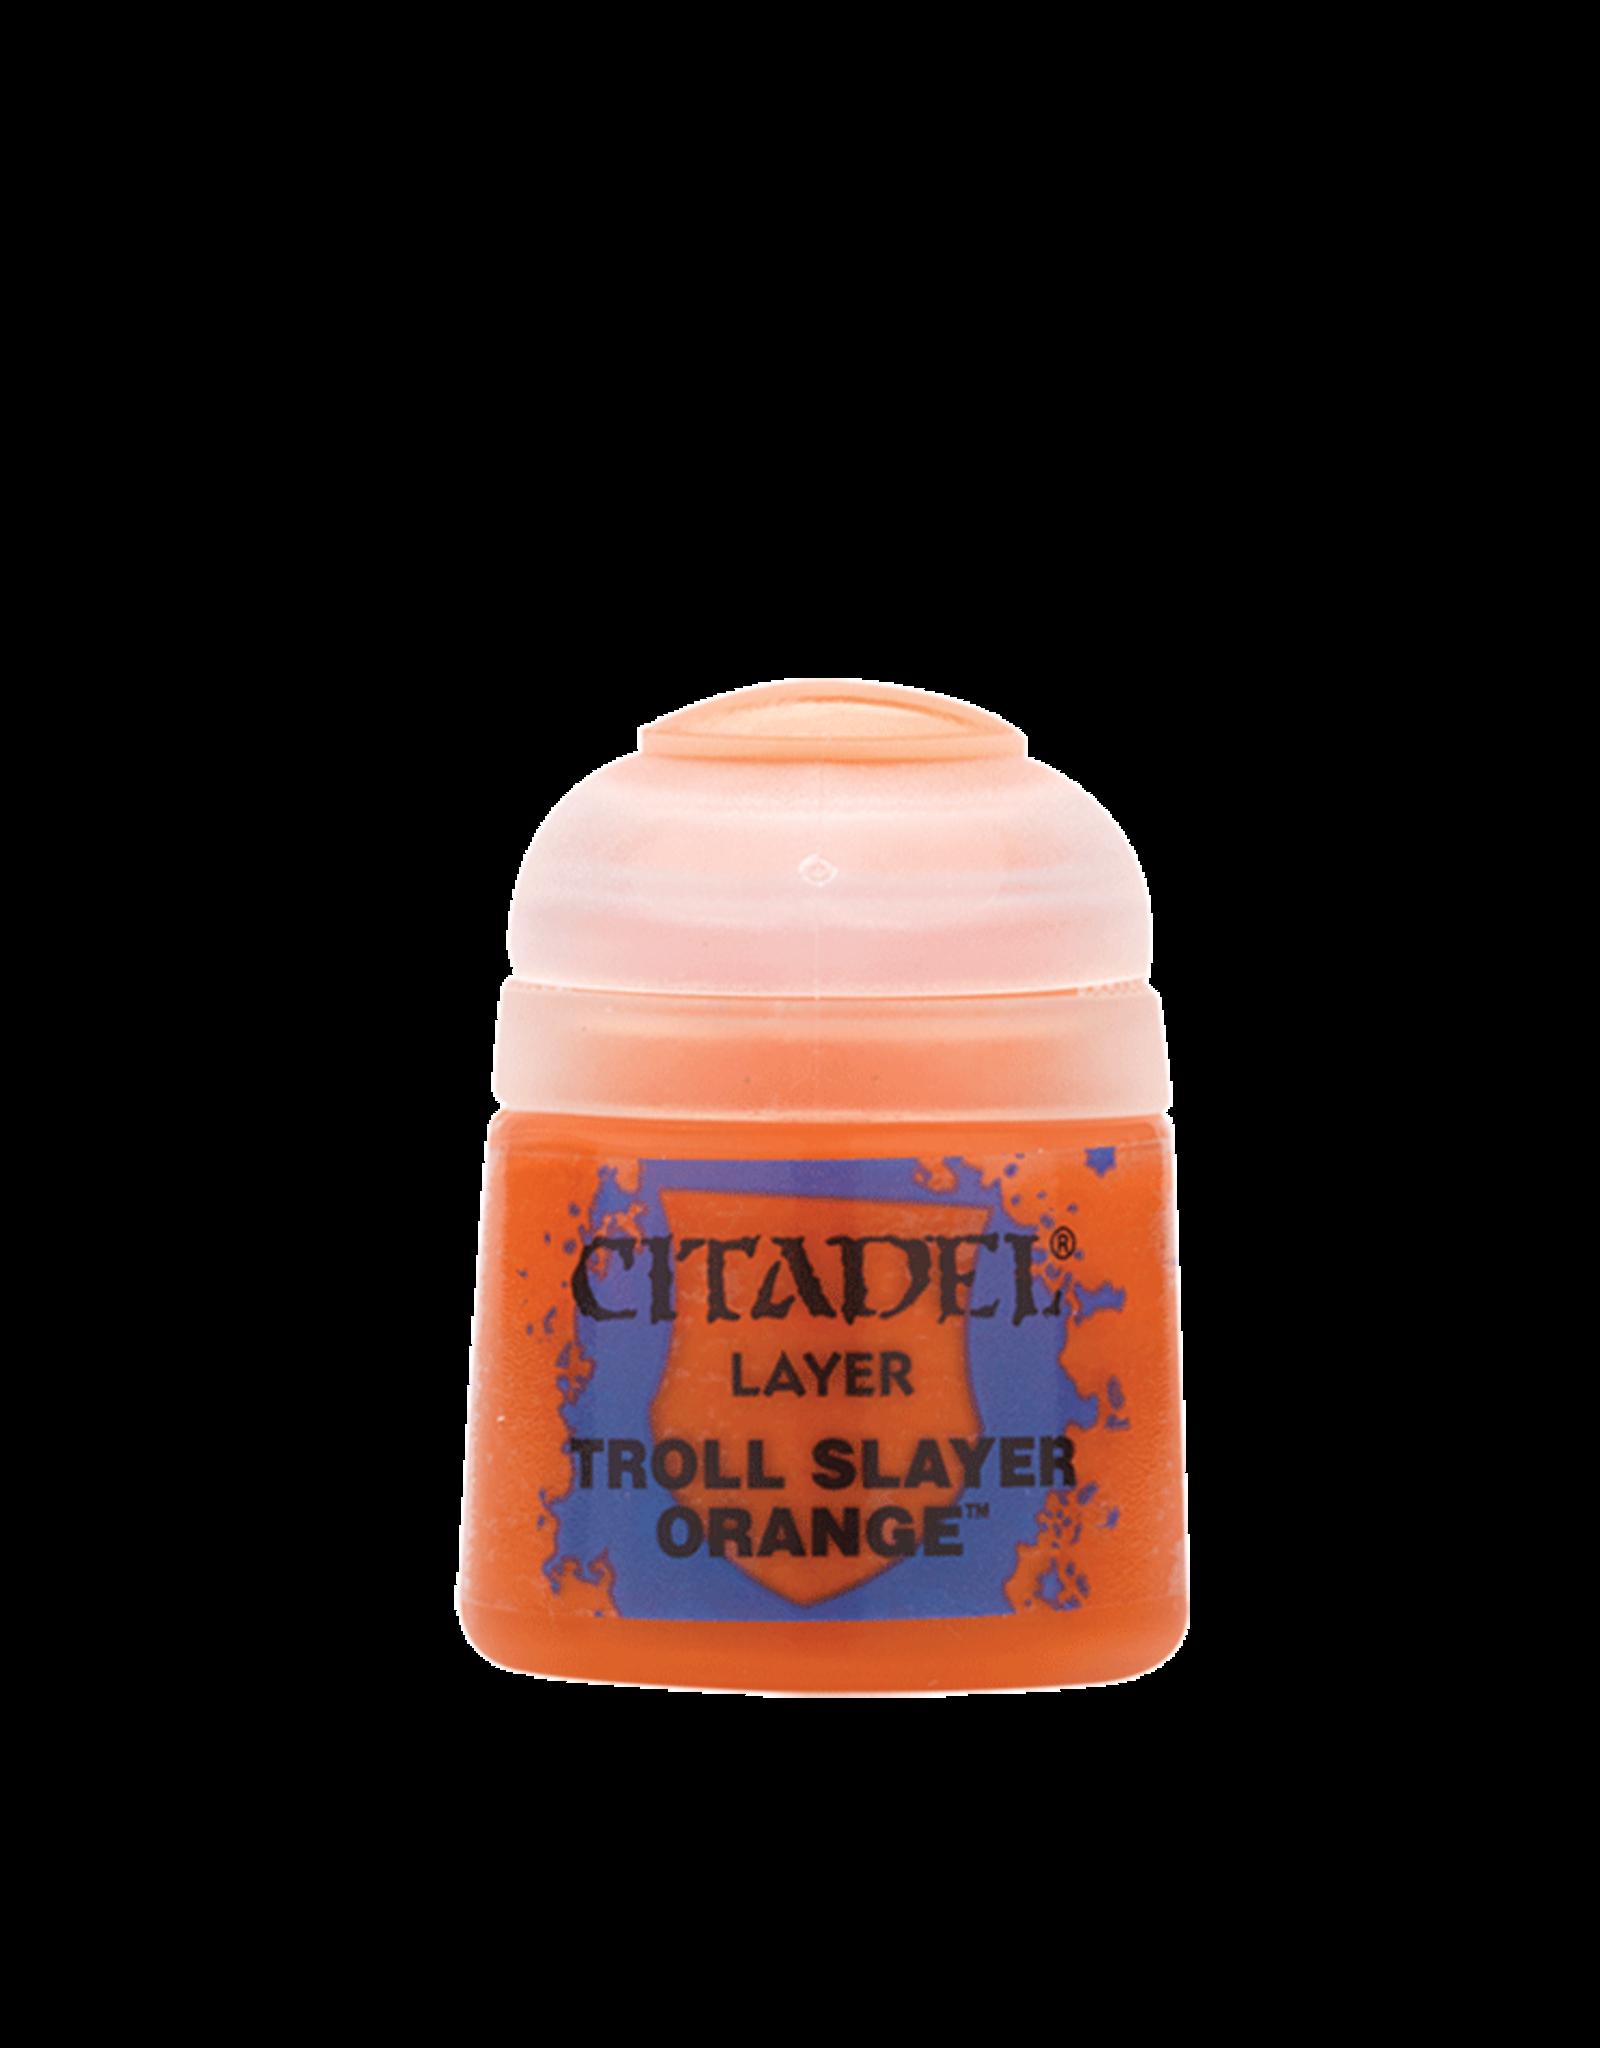 Citadel Citadel Layer: Troll Slayer Orange (12ml)